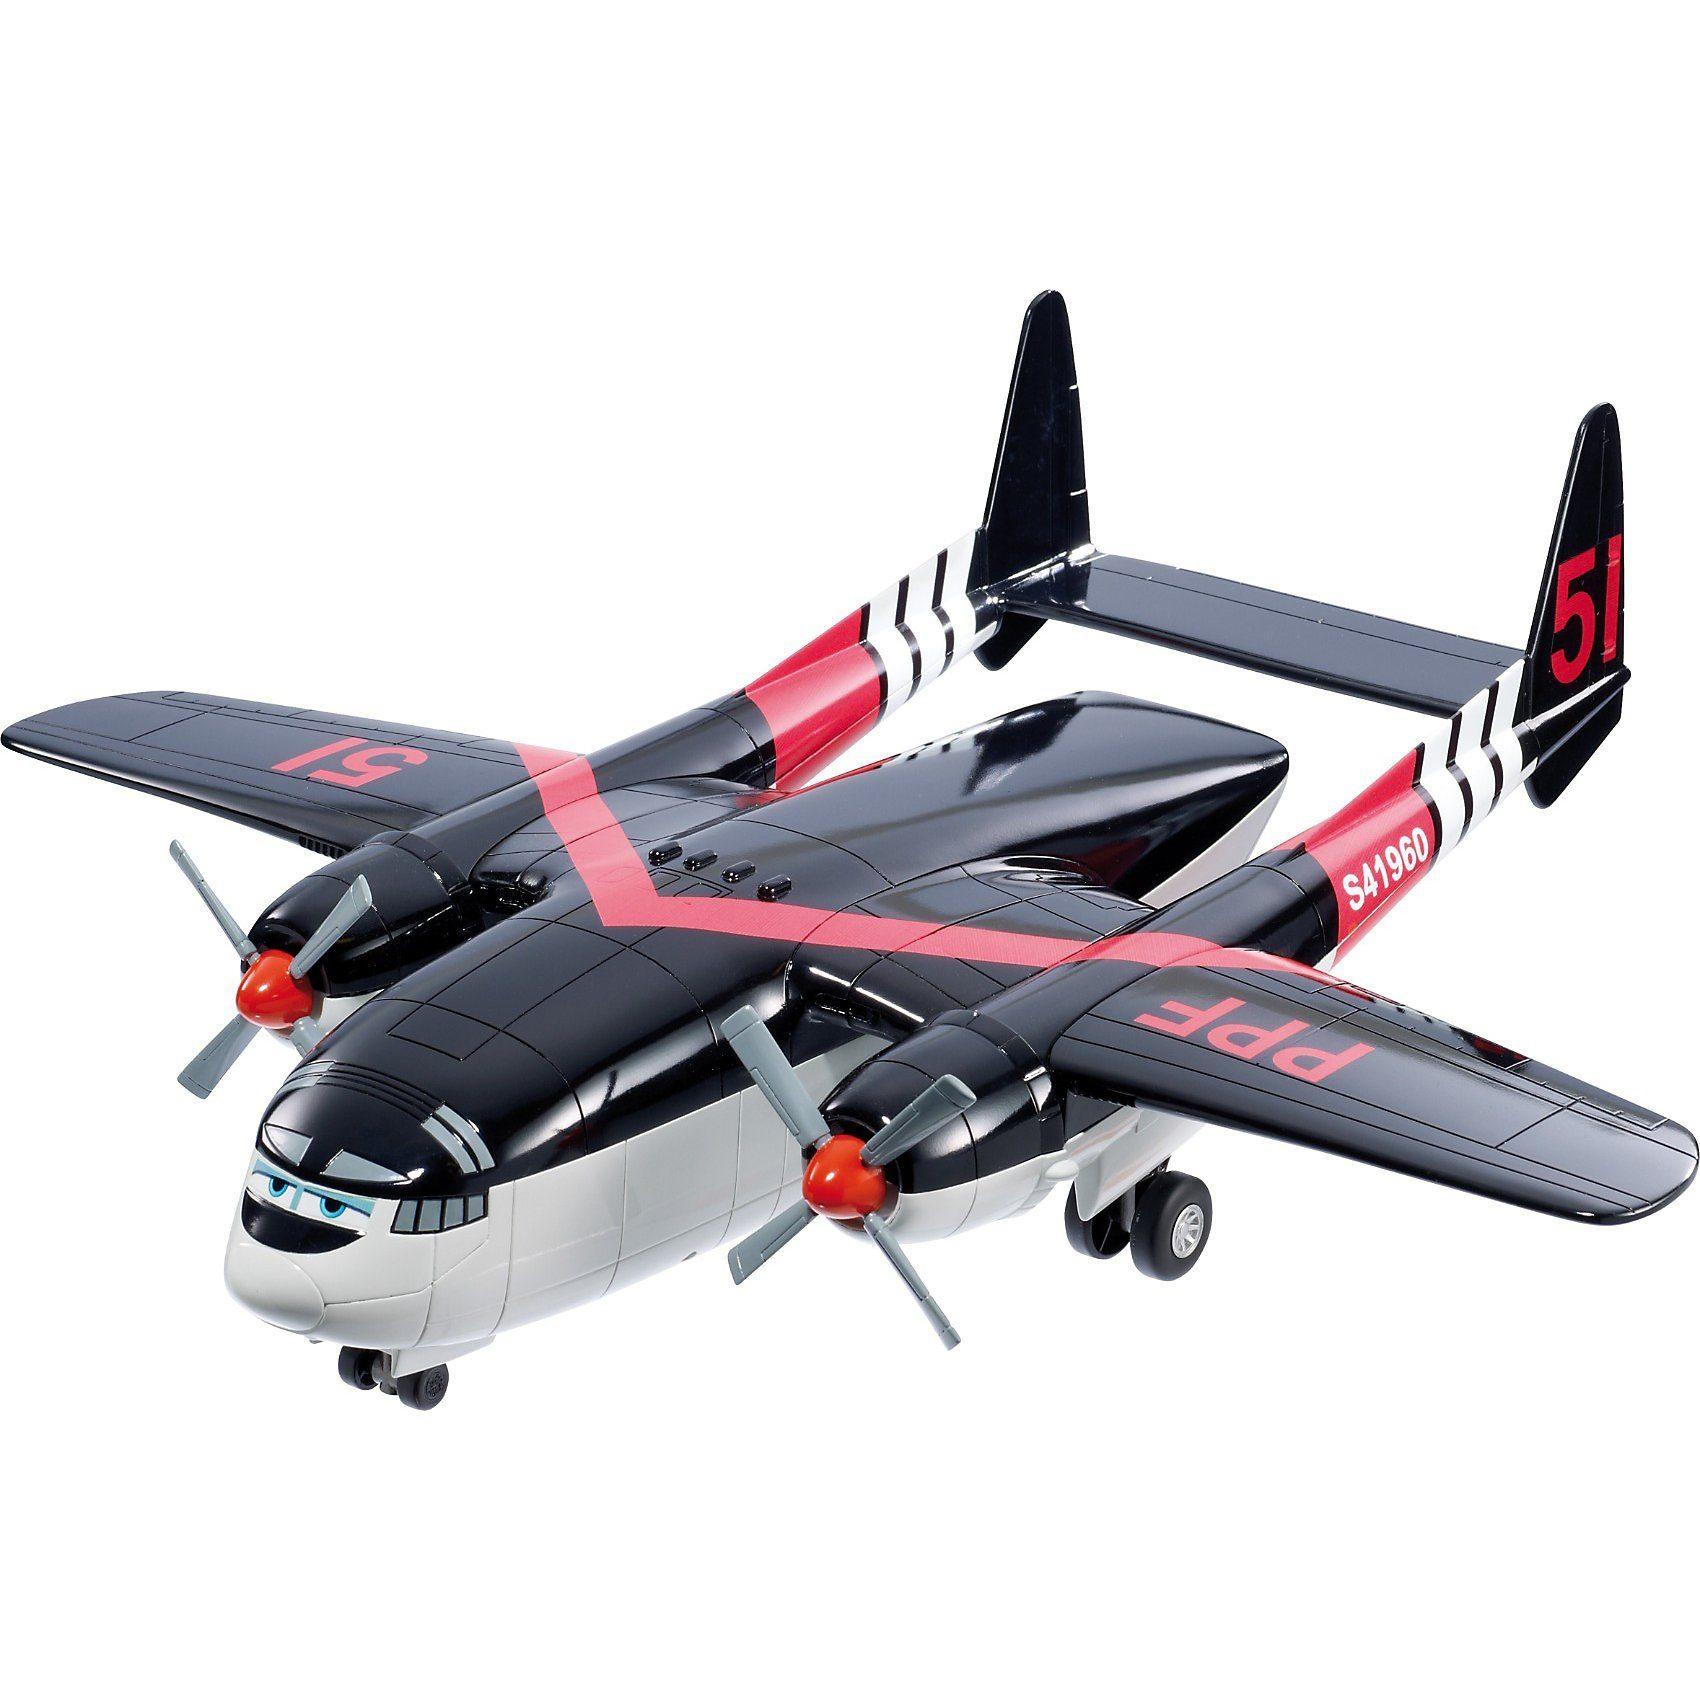 Mattel Planes 2 Cabbie Transportflugzeug